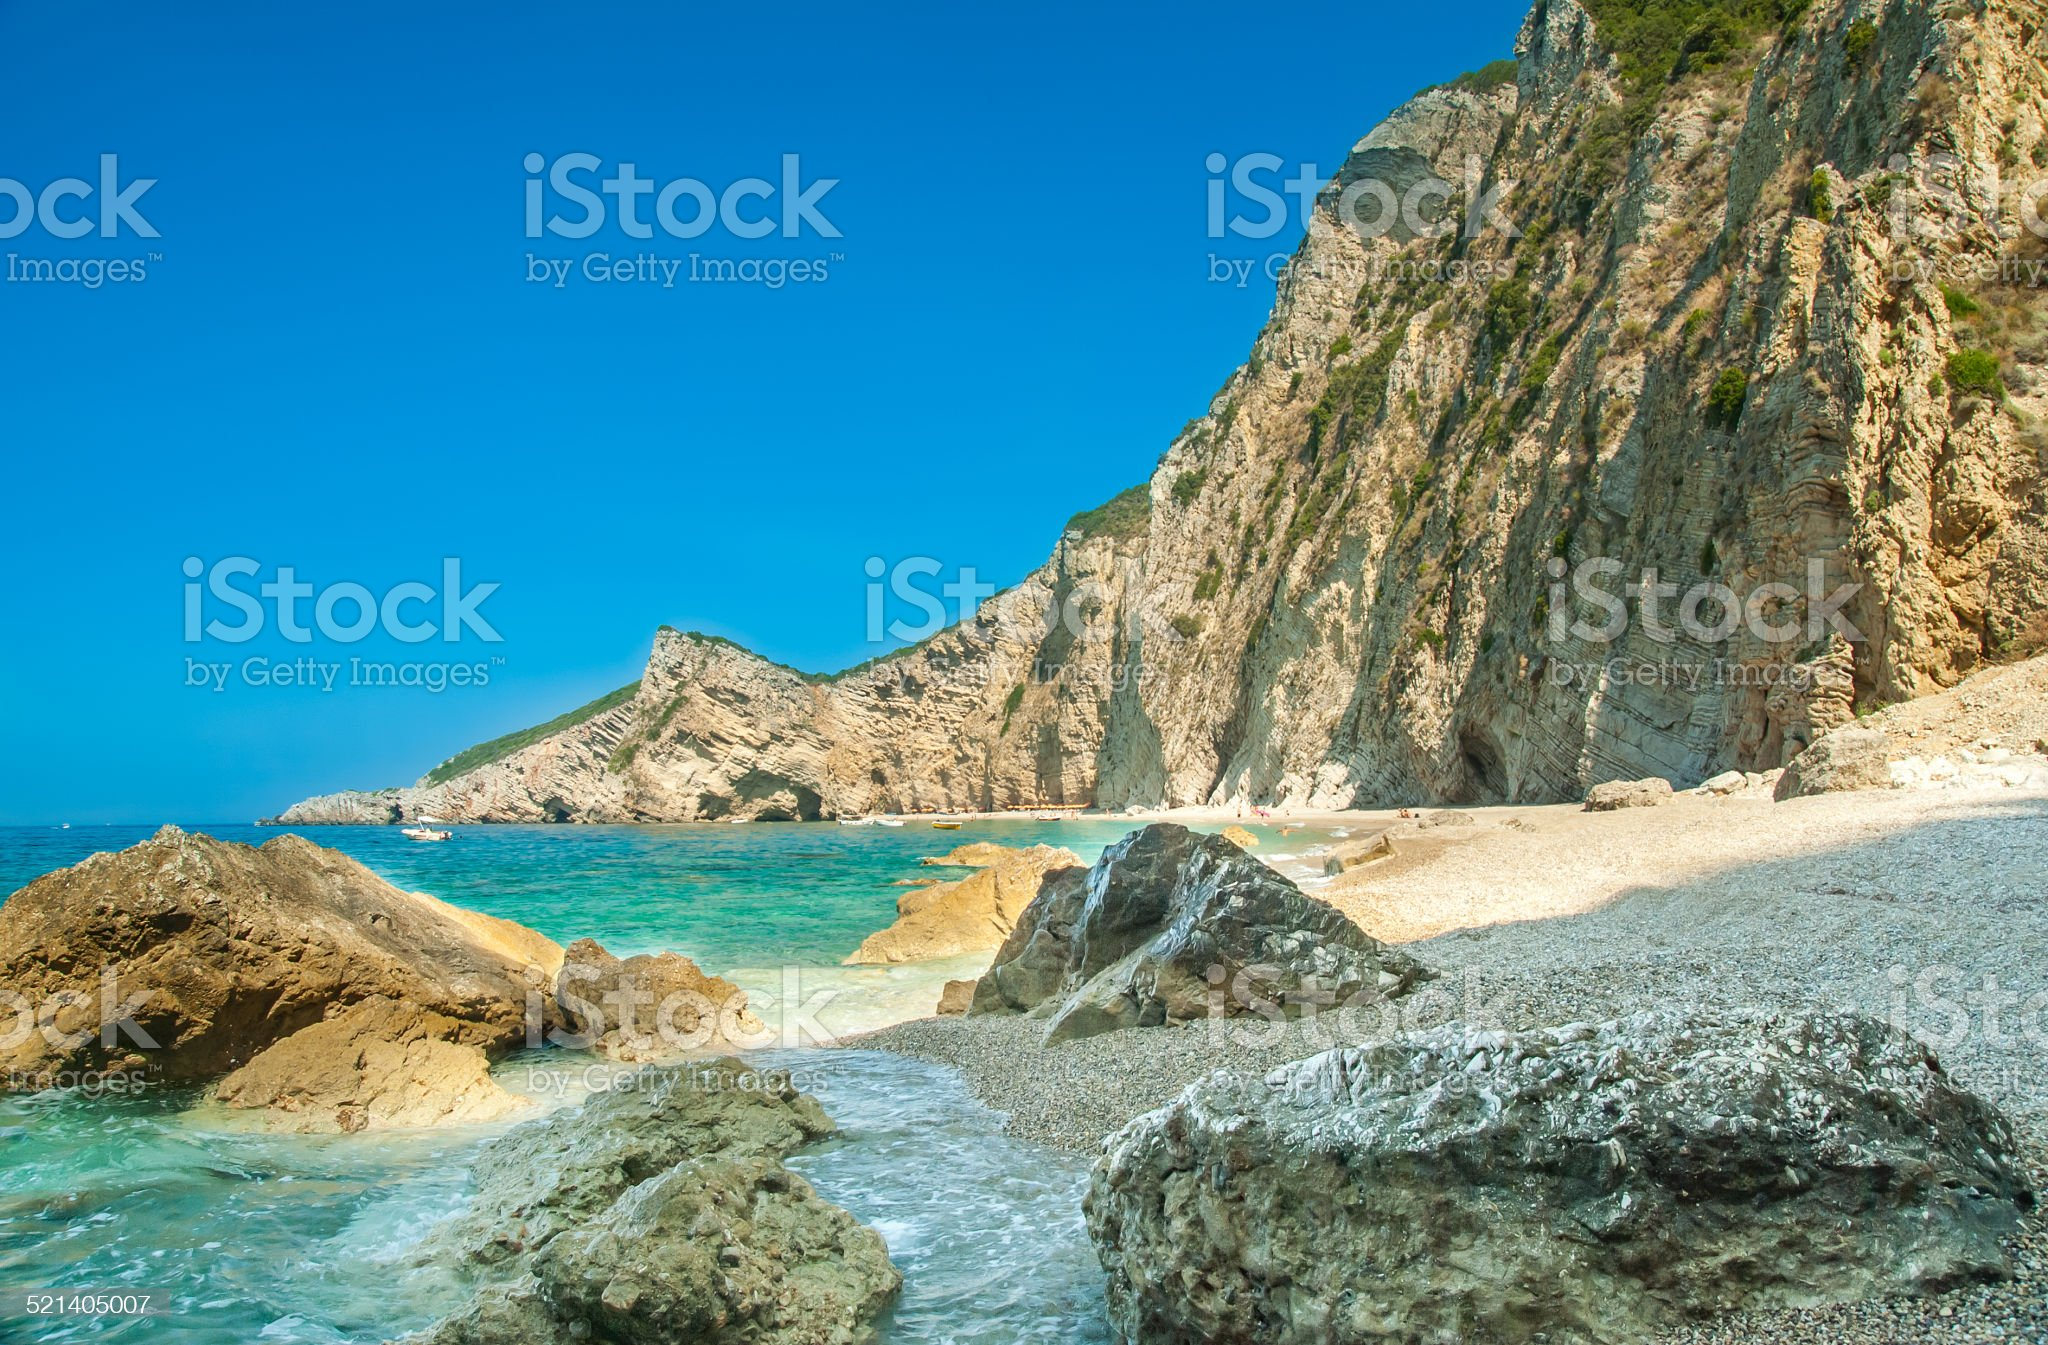 ✓ Paradise Beach near Liapades, Corfu Island, Greece Stock Photos